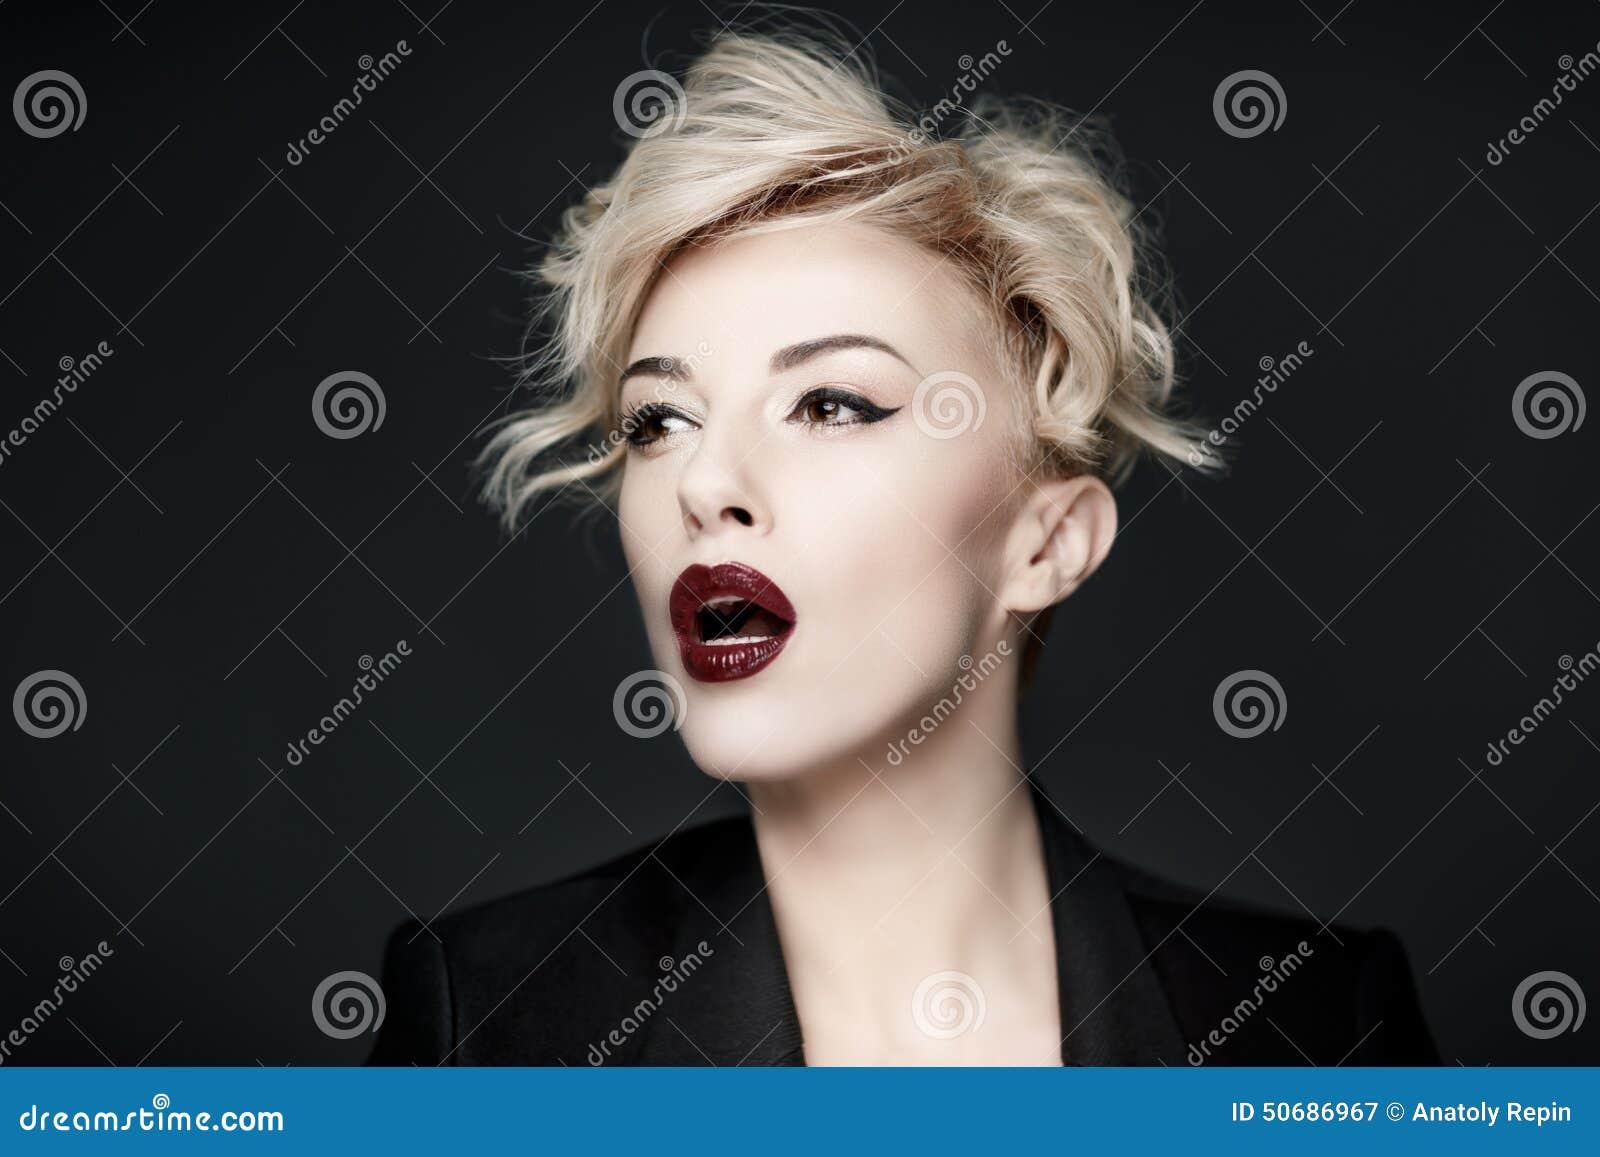 Download 一名美丽的妇女的画象有干净的皮肤的 库存图片. 图片 包括有 干净, 逗人喜爱, 人力, 白种人, 有吸引力的 - 50686967